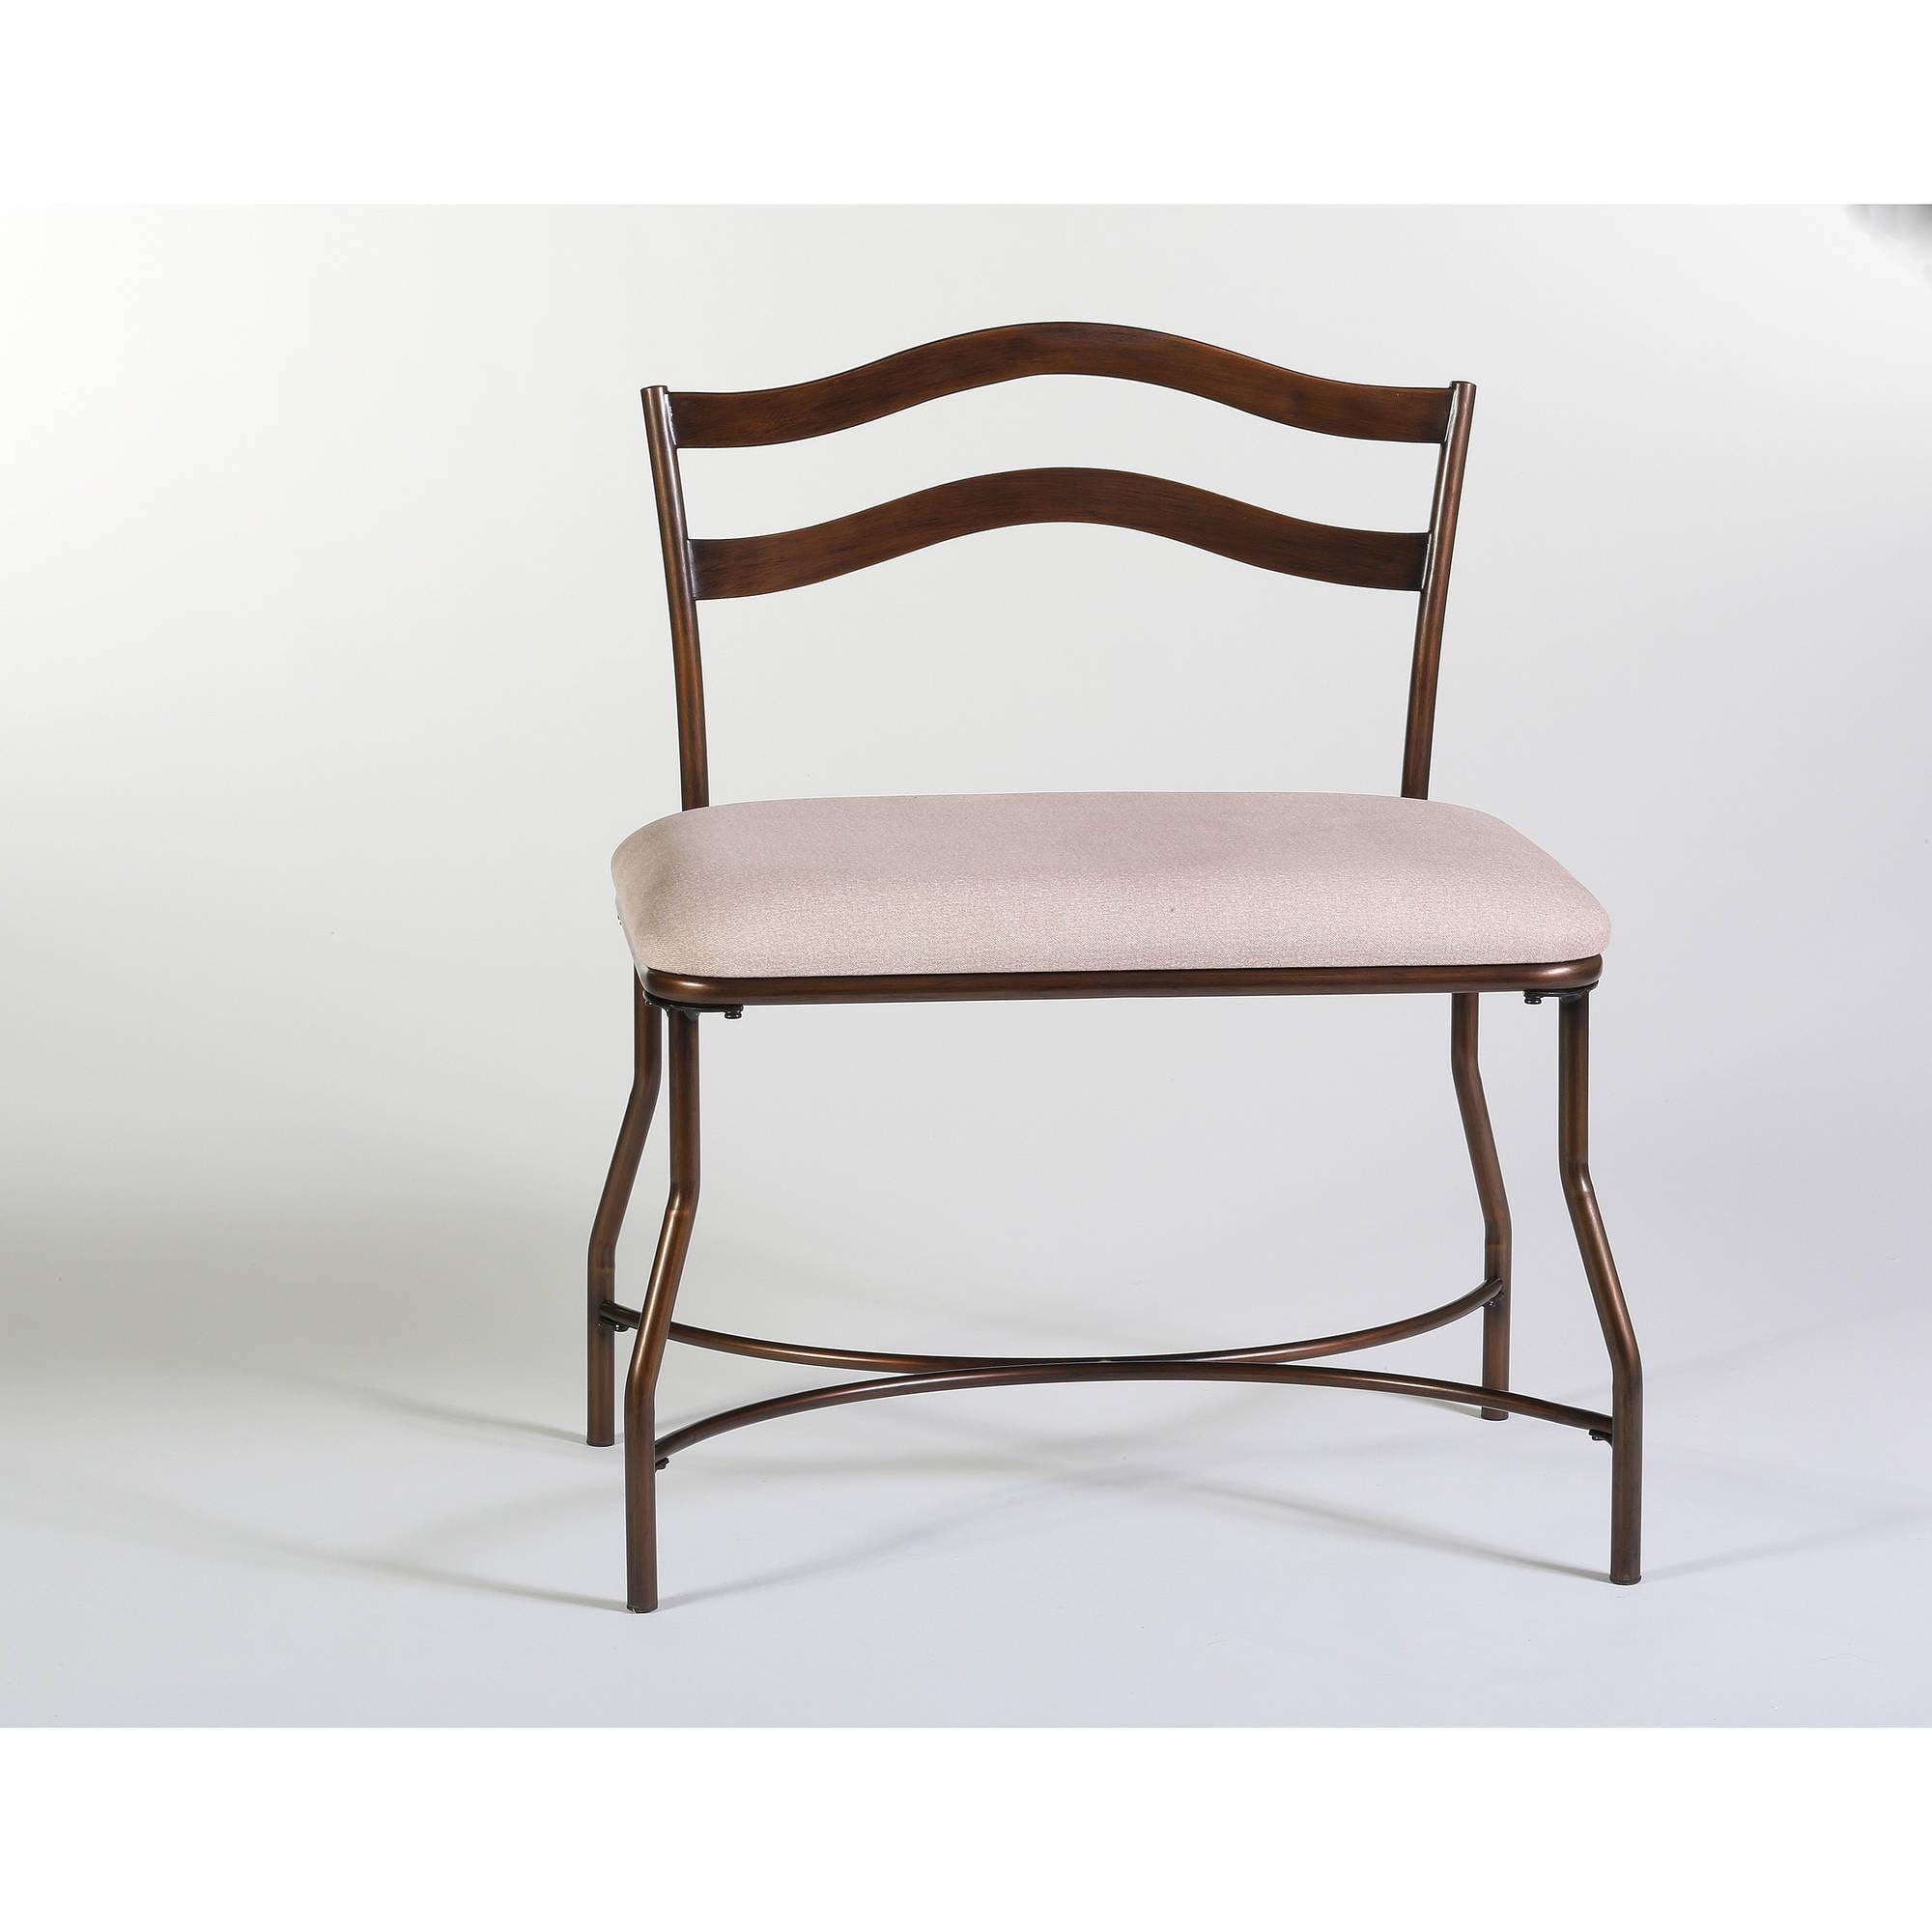 "Hillsdale Furniture, Windsor 26.5"" Vanity Stool, Burnished Bronze Finish by Hillsdale Furniture"